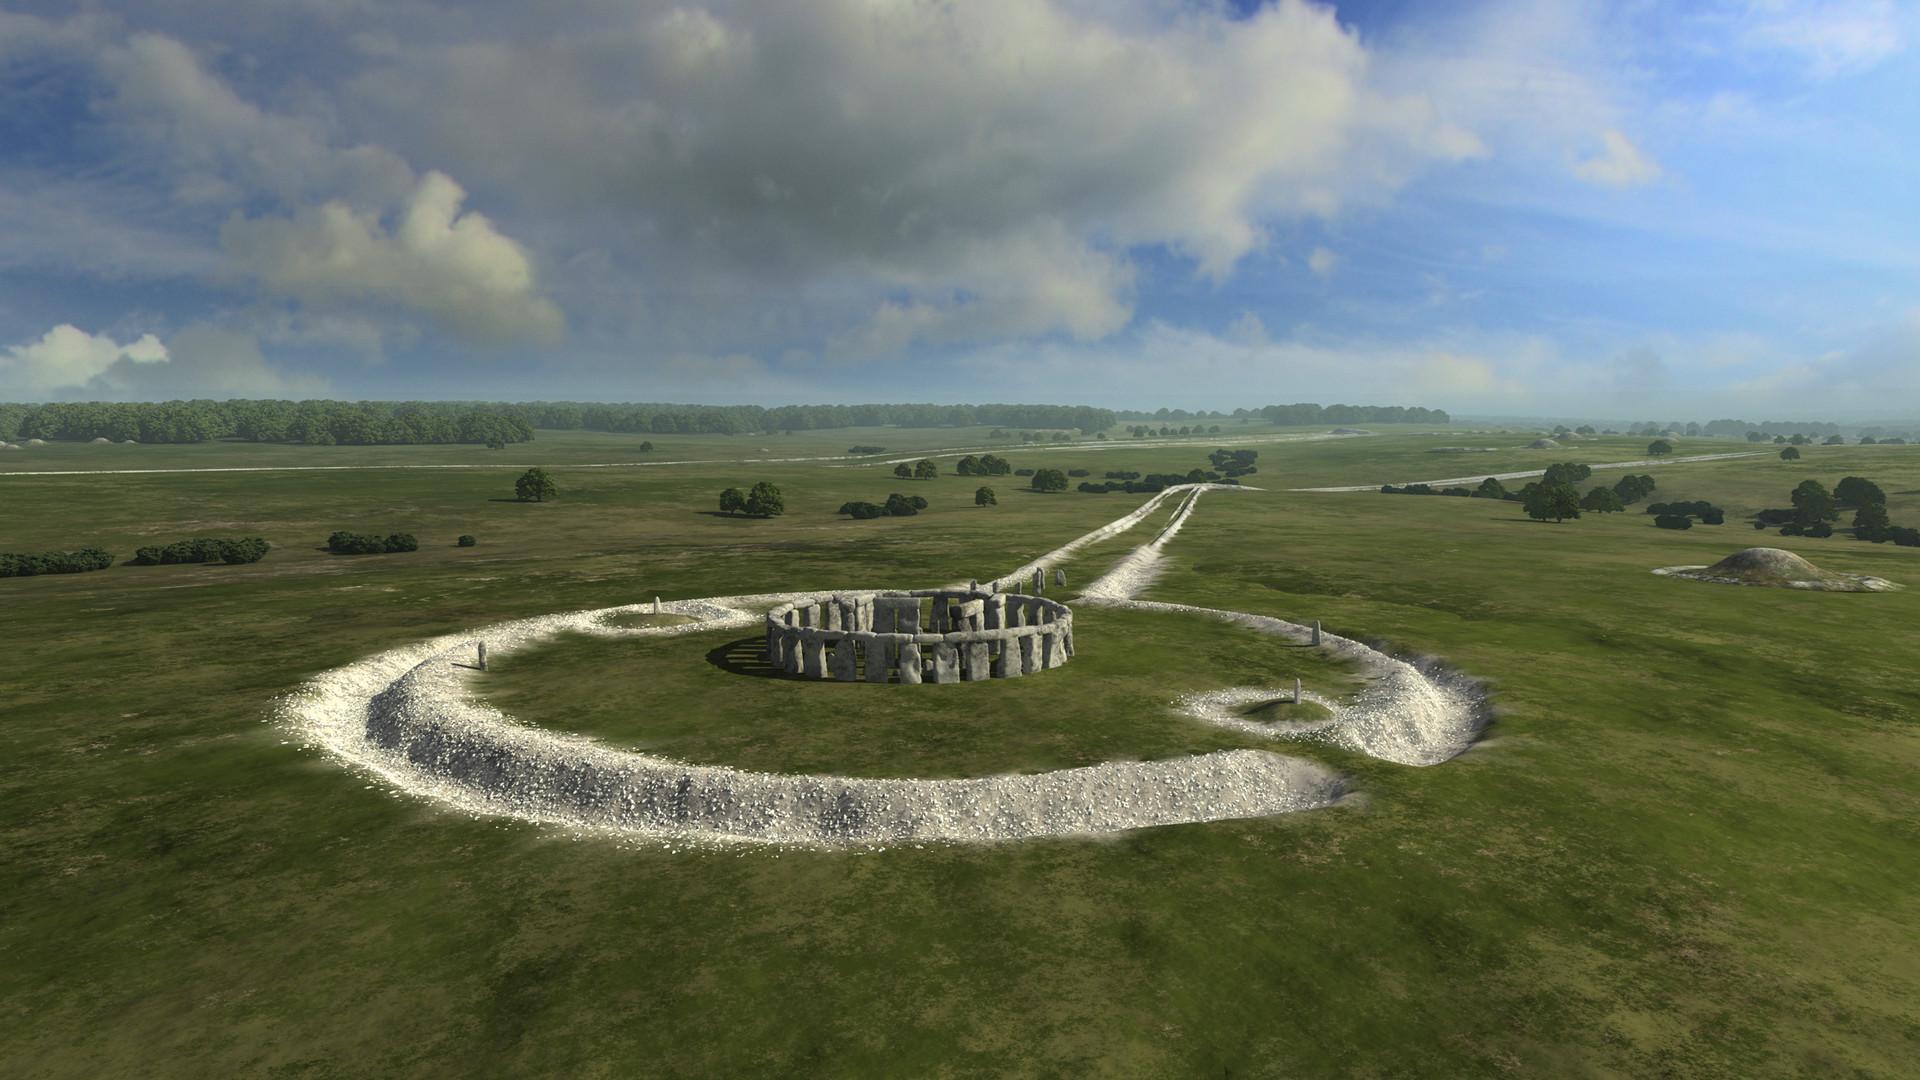 Juan torrejon visualisierung stonehenge 7reasons medien gmbh lbi archpro